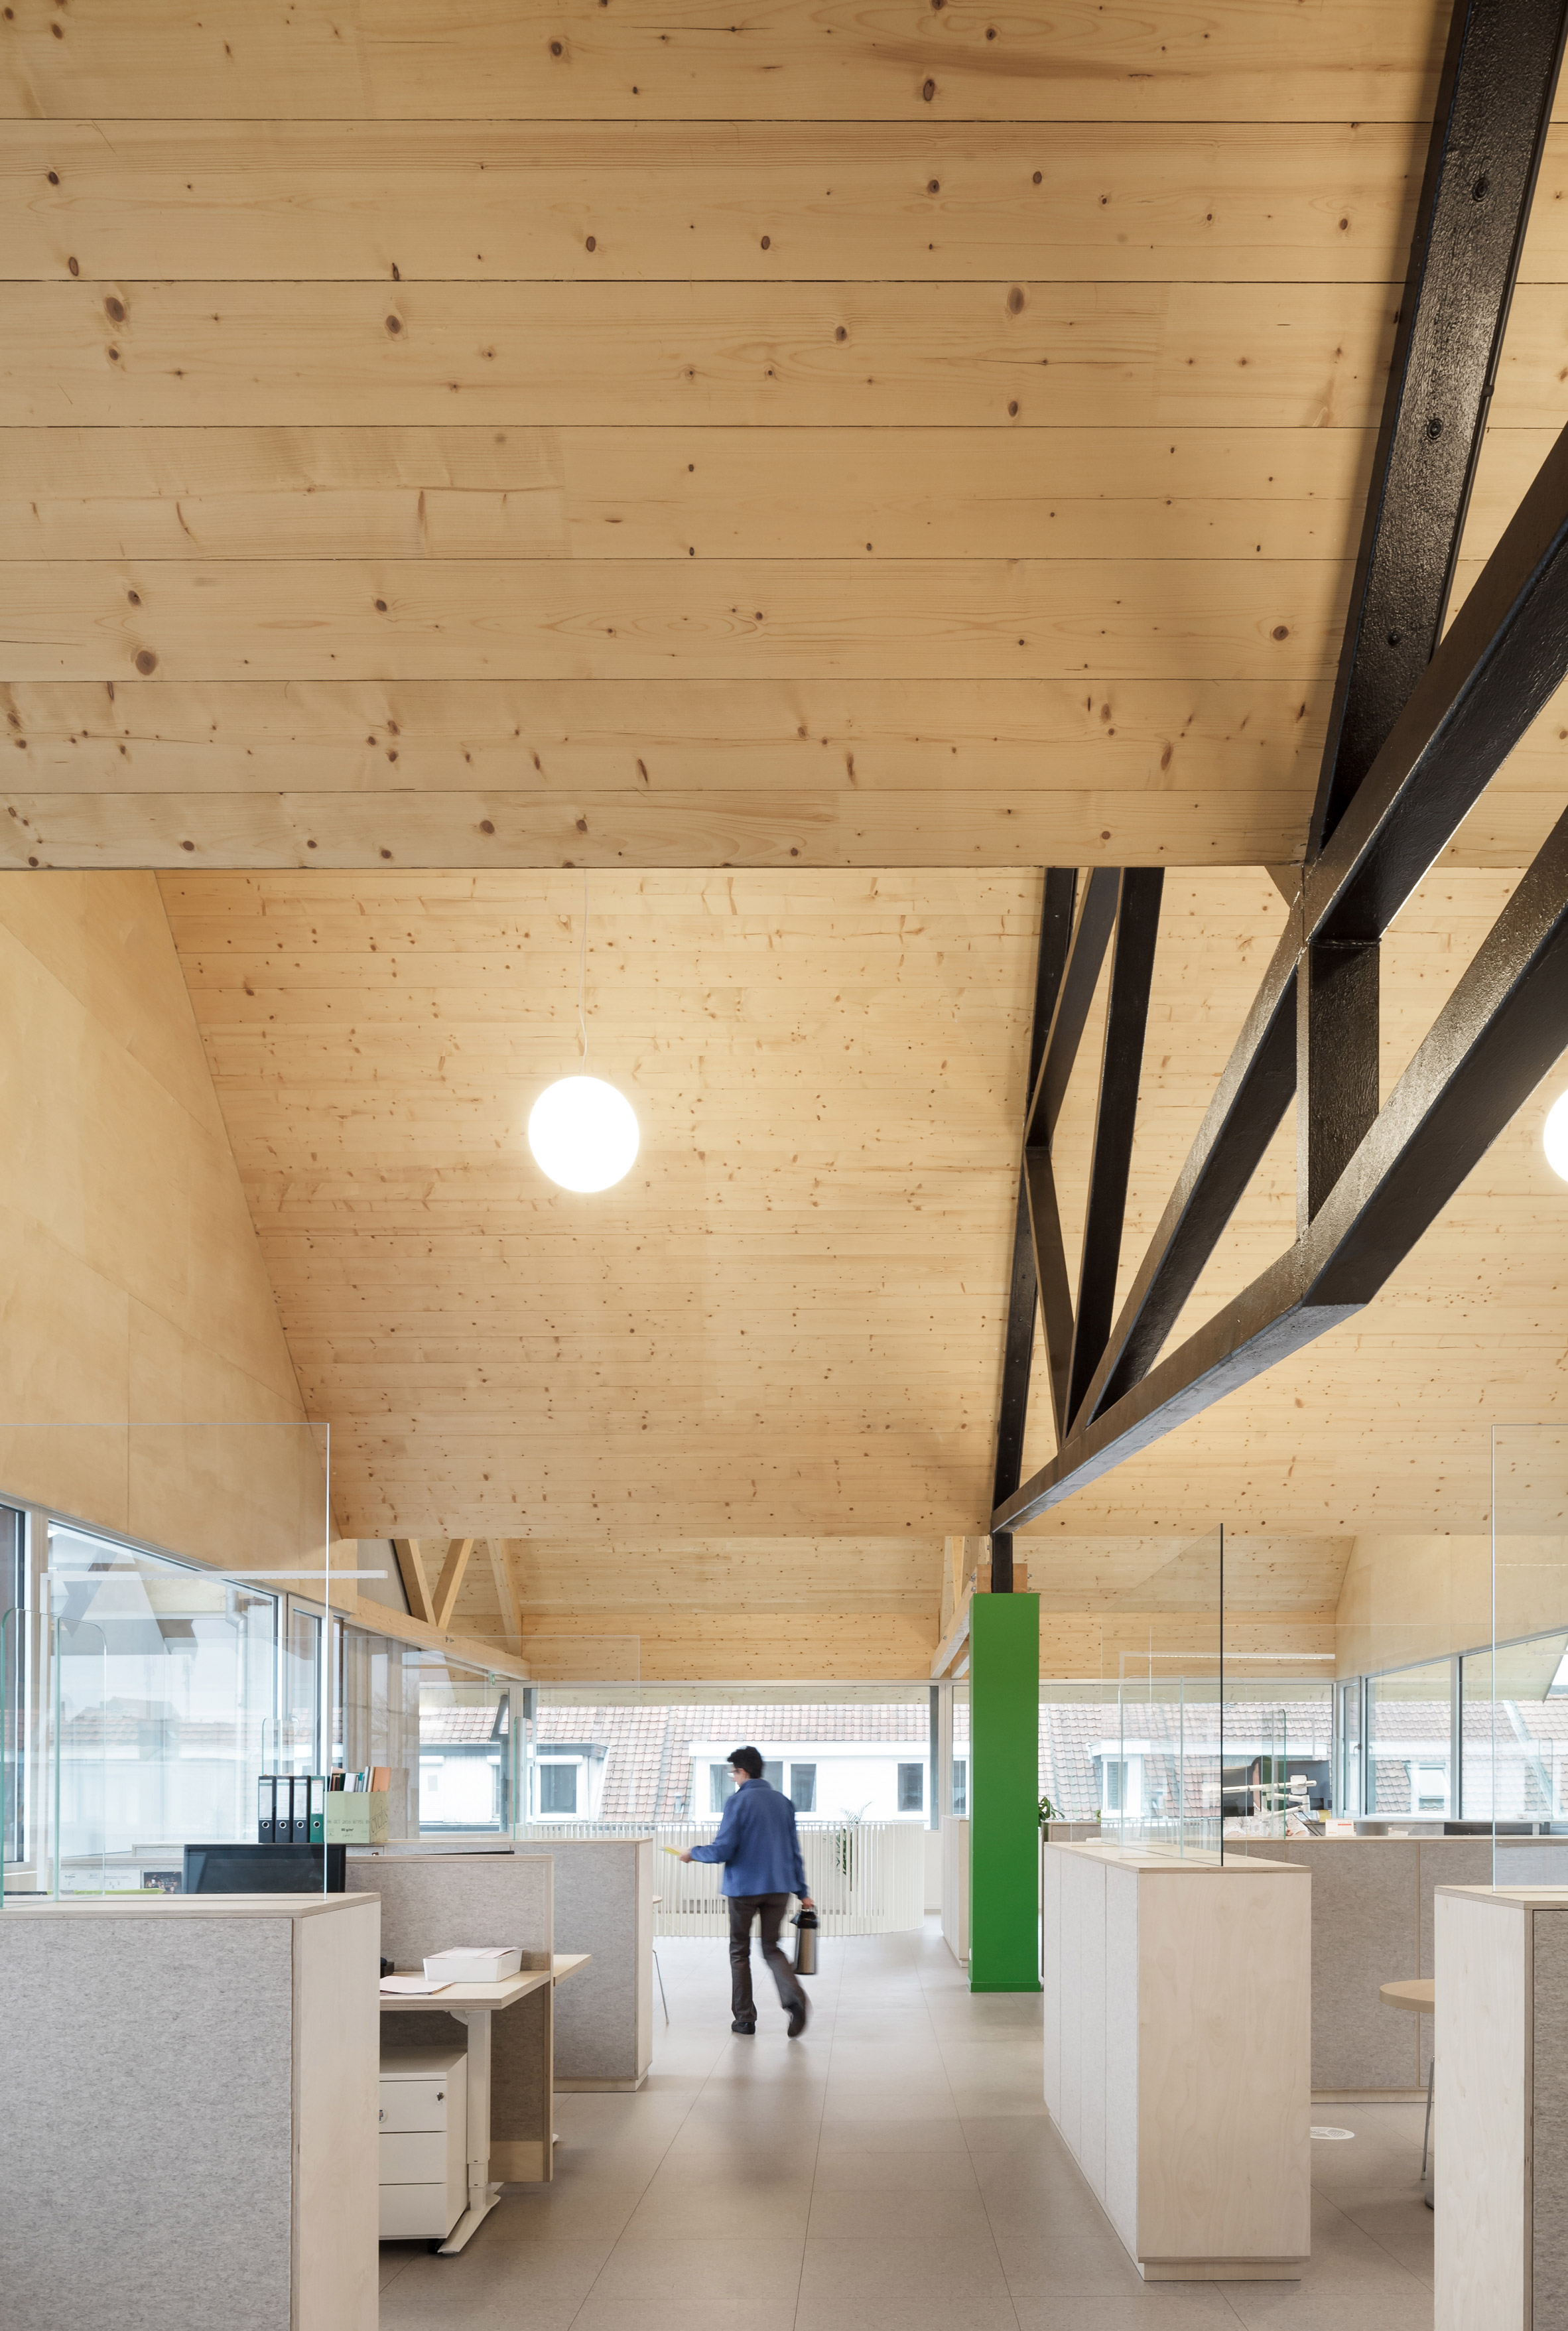 ryhove-ghent-trans-architecture-offices-belgium-_dezeen_2364_col_0.jpg